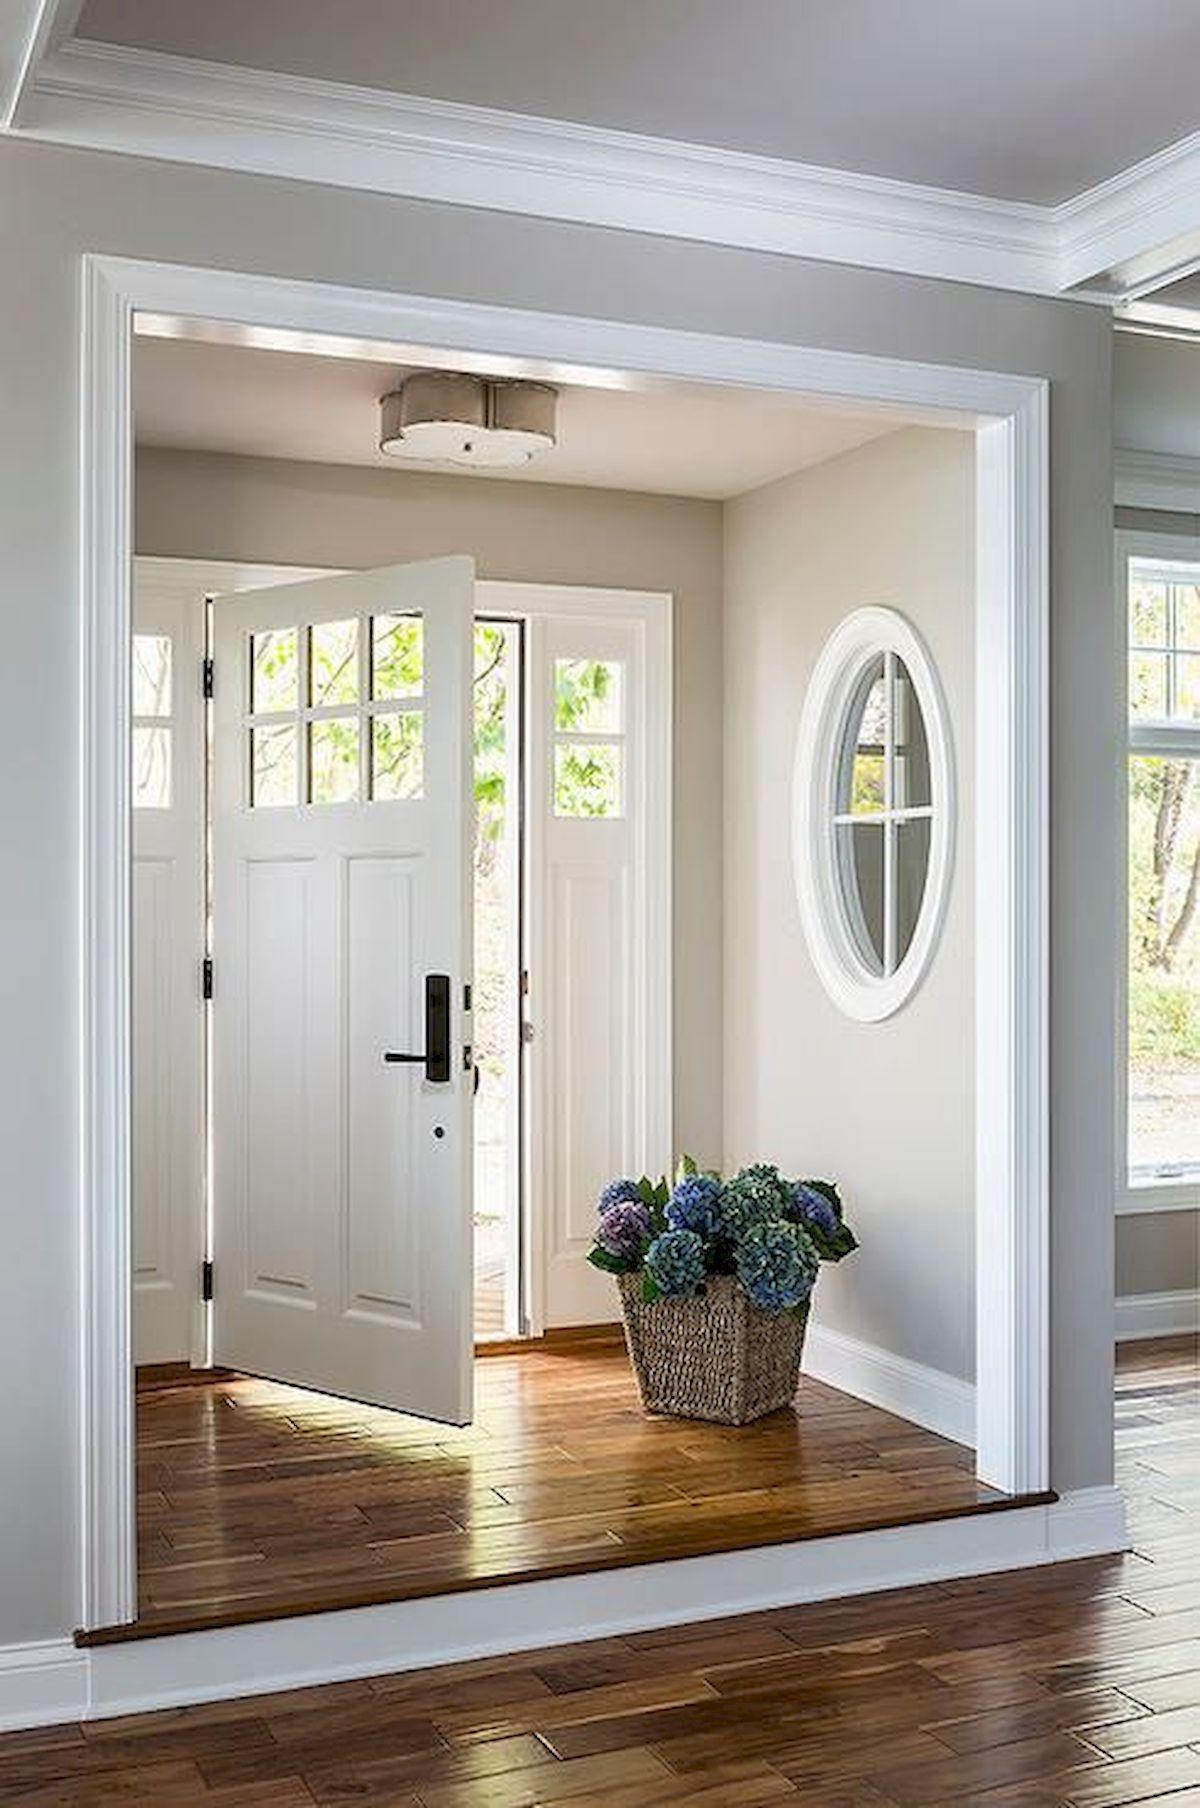 20 Stunning Front Door Designs: 70 Beautiful Farmhouse Front Door Design Ideas And Decor